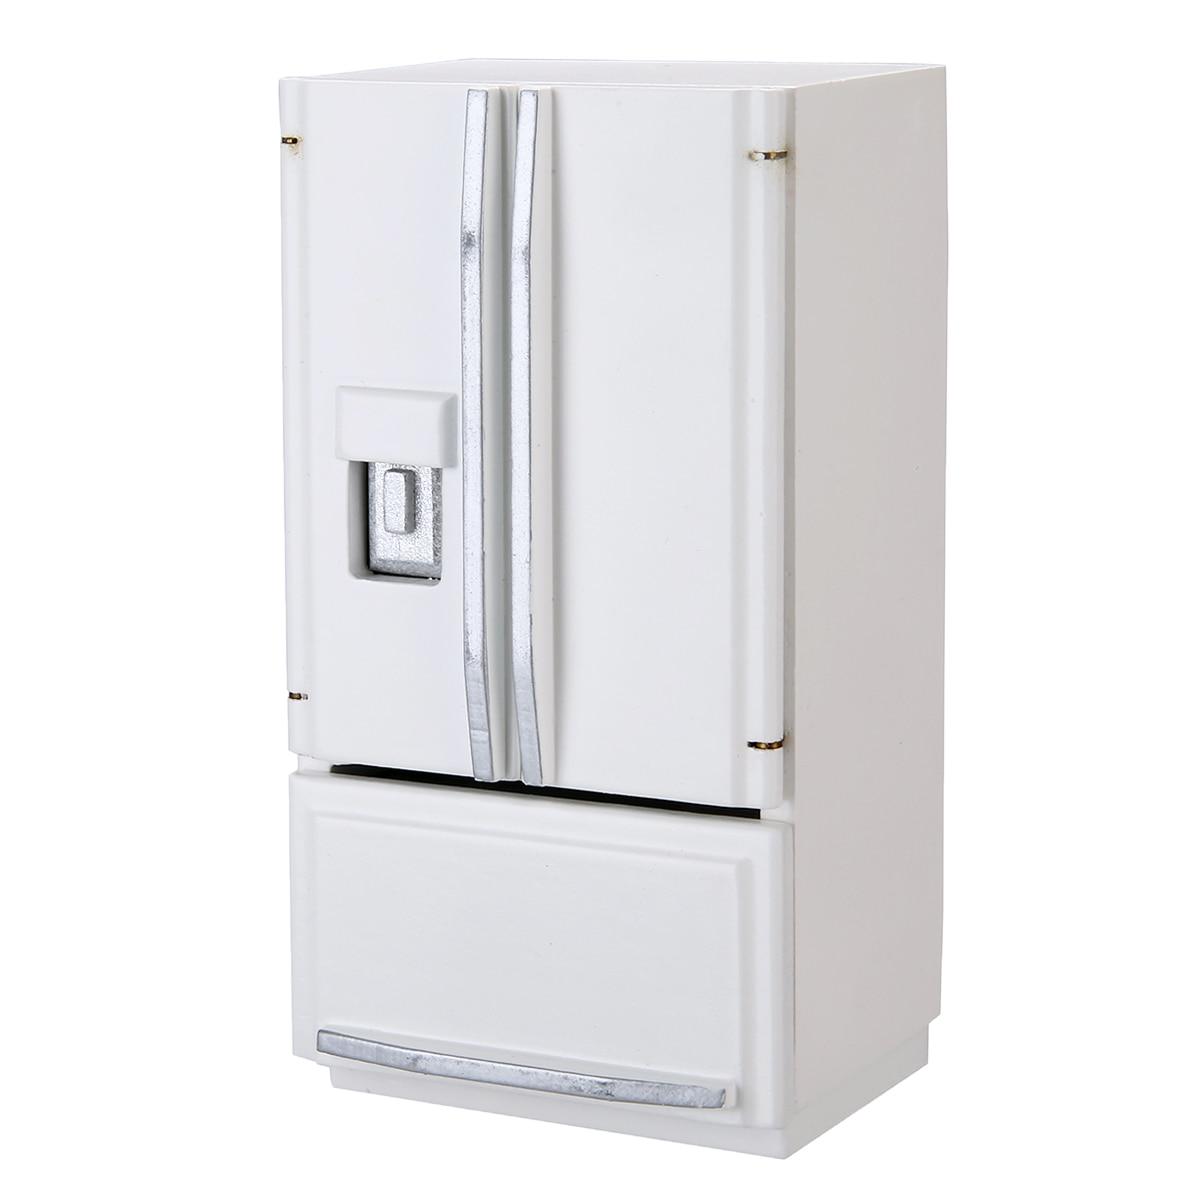 1:12 Dollhouse Furniture Mini Furniture Refrigerator Miniature Kids Living Room Pretend Play Toys Accessories